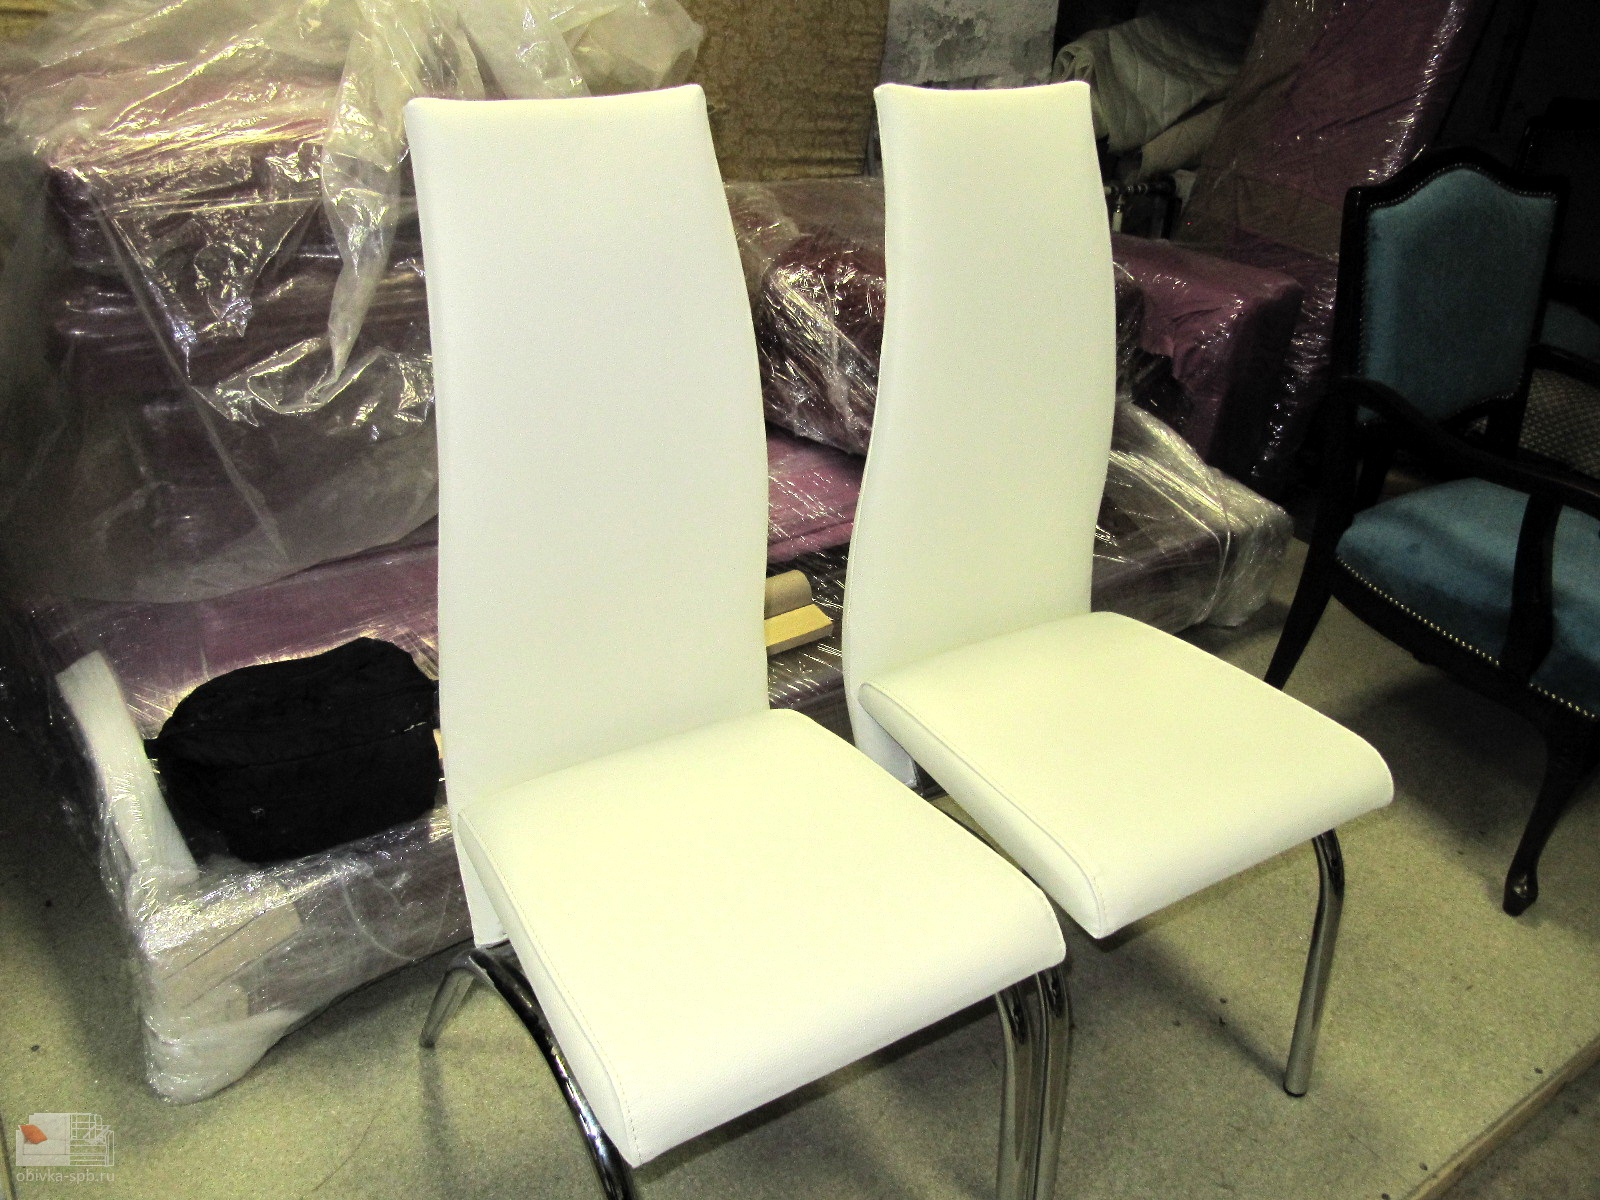 Upholstery- How to Diamond Tuft Мебель, Обивка и Мягкая 13